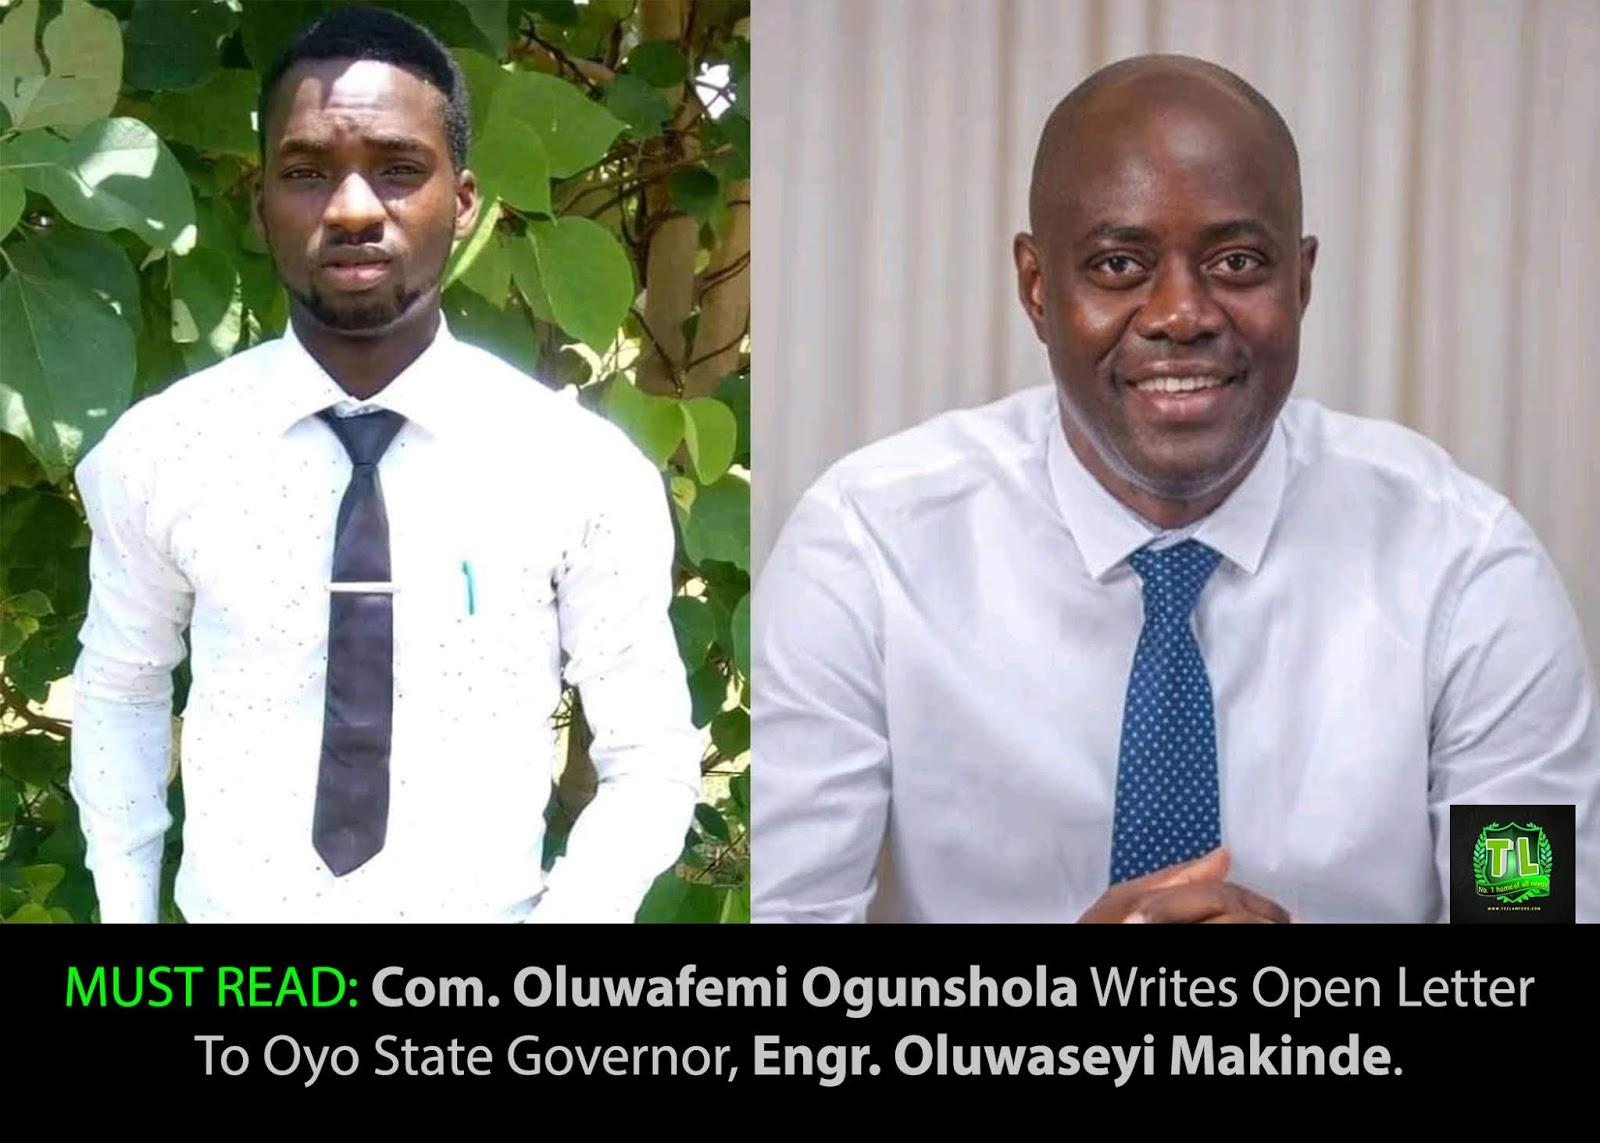 A Must Read Com Oluwafemi Ogunshola Writes Open Letter To Oyo State Governor Gov Oluwaseyi Makinde